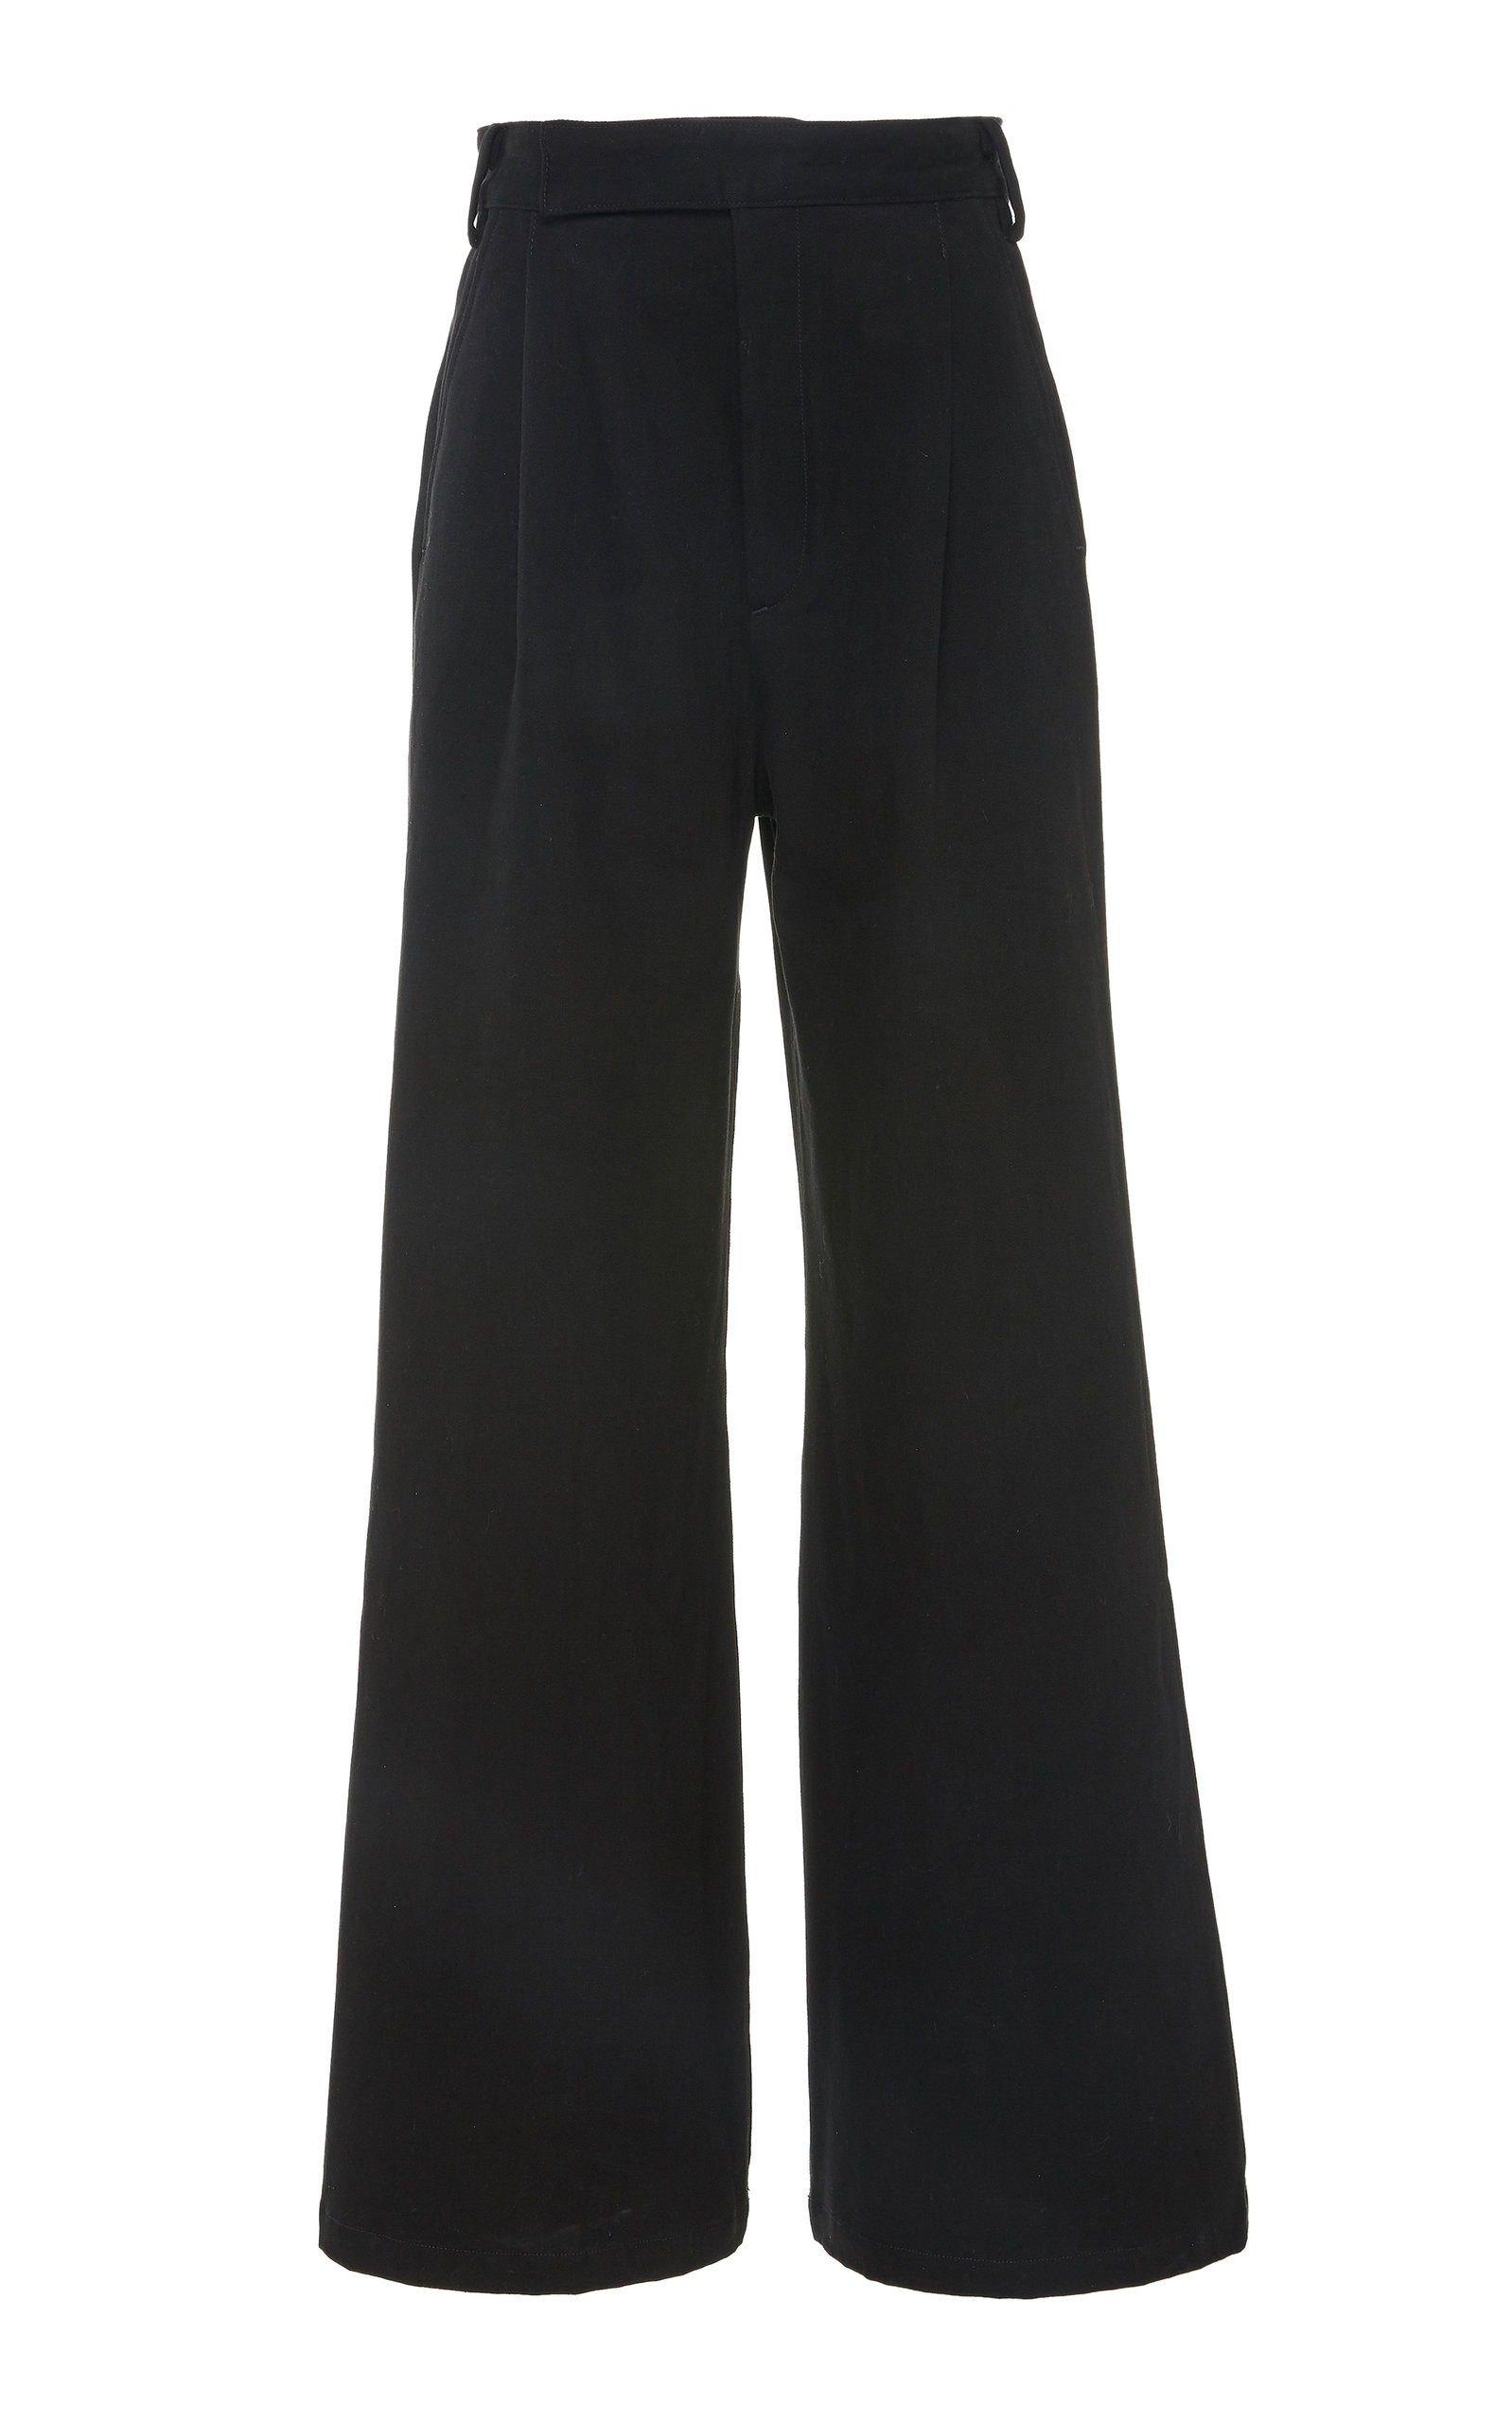 Goldsign Pants The Ultra Wide Leg Trouser